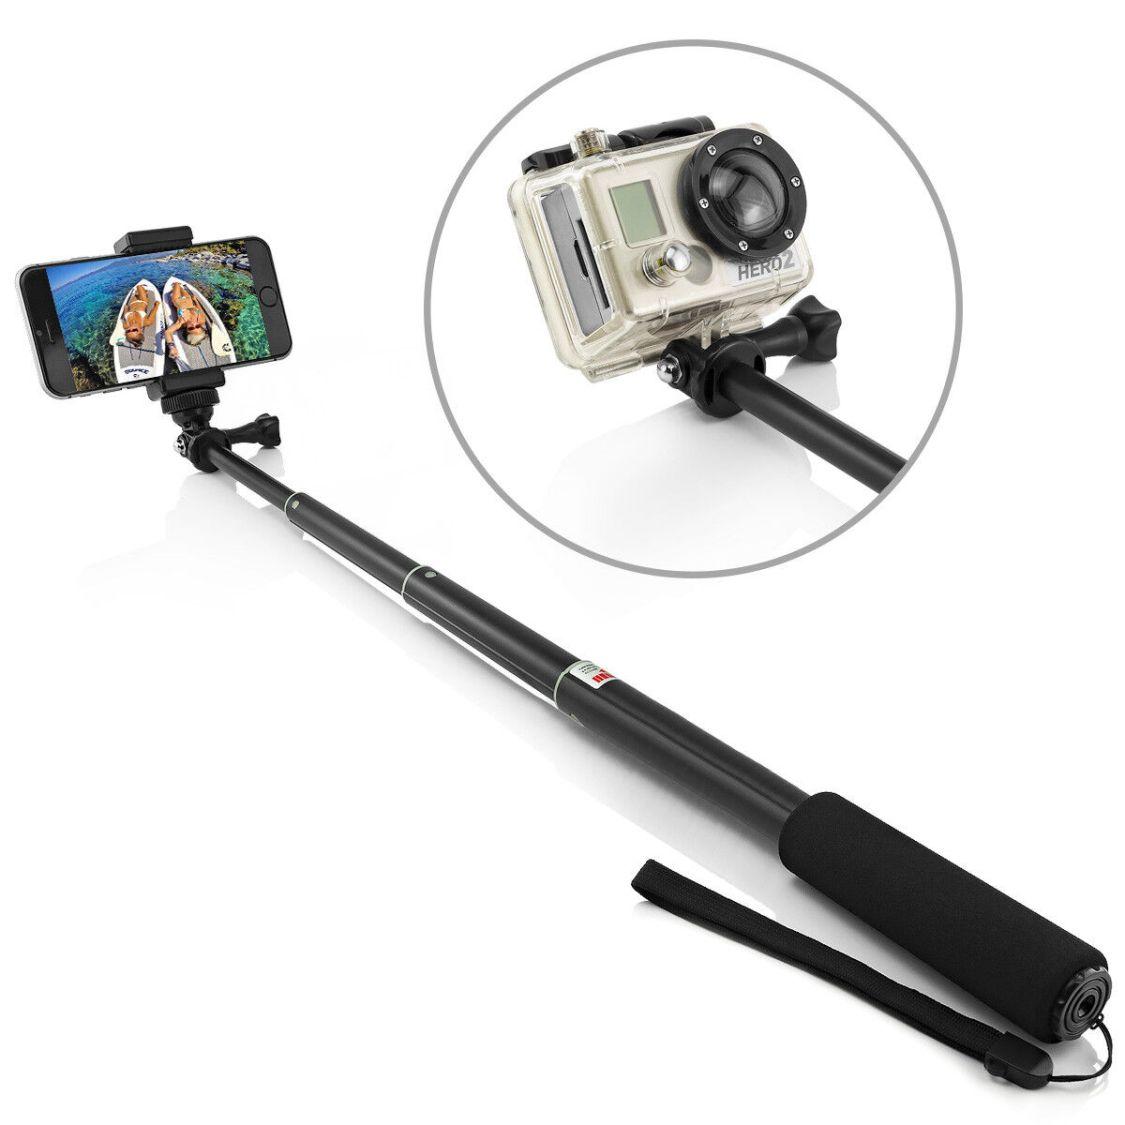 Selfiestick Selfie Stick Stange Handy Smartphone GoPro Hero 4 Monopod Cam Camera